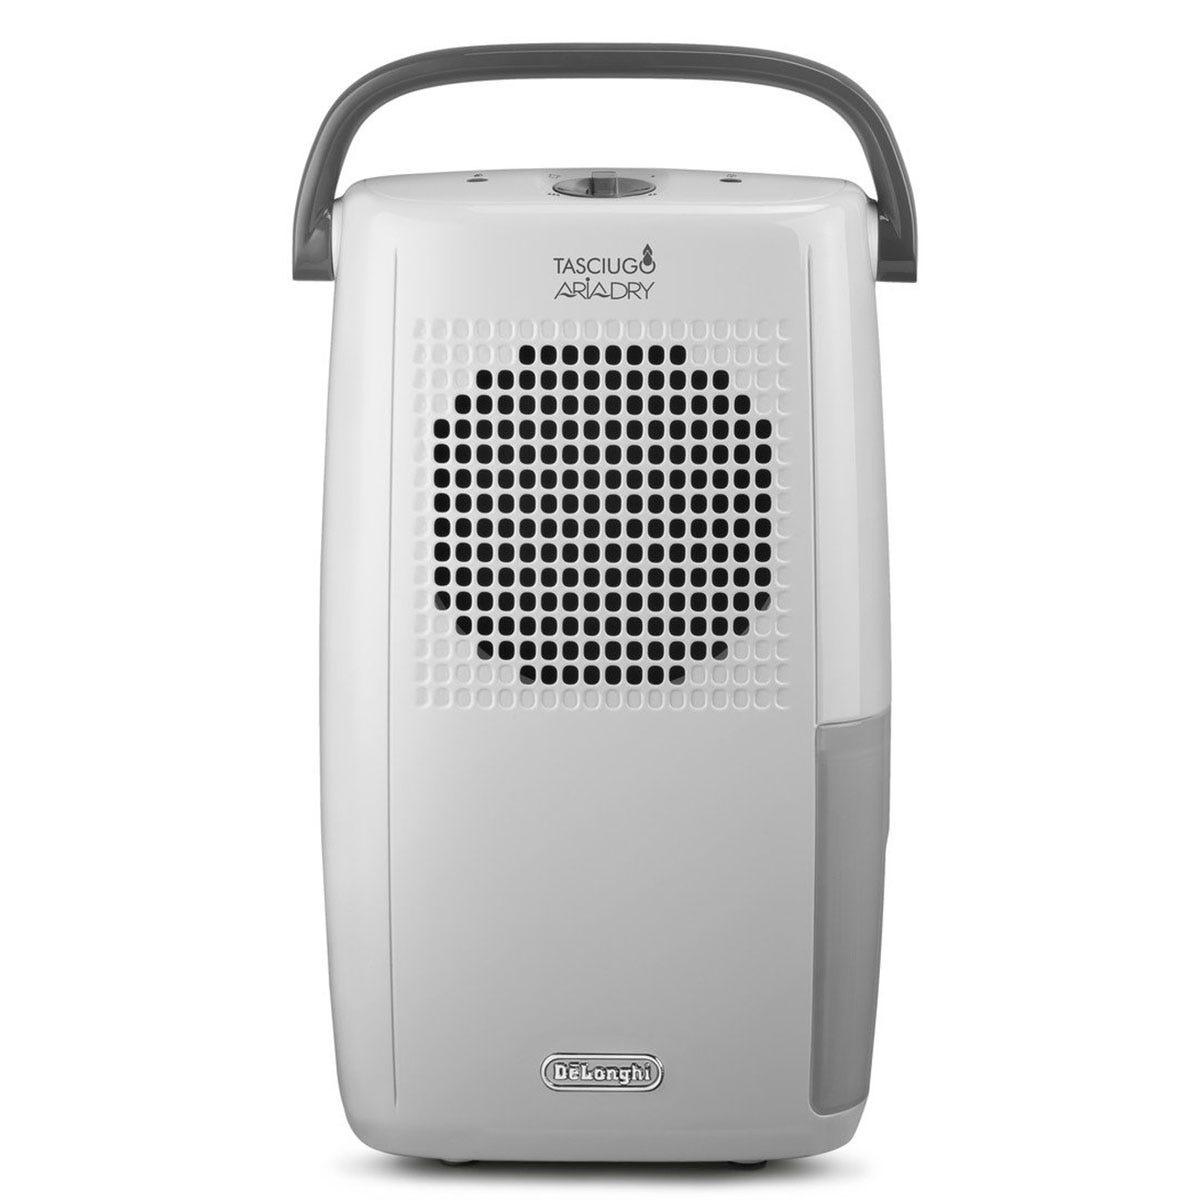 Delonghi De'Longhi DX10 Dehumidifier - White